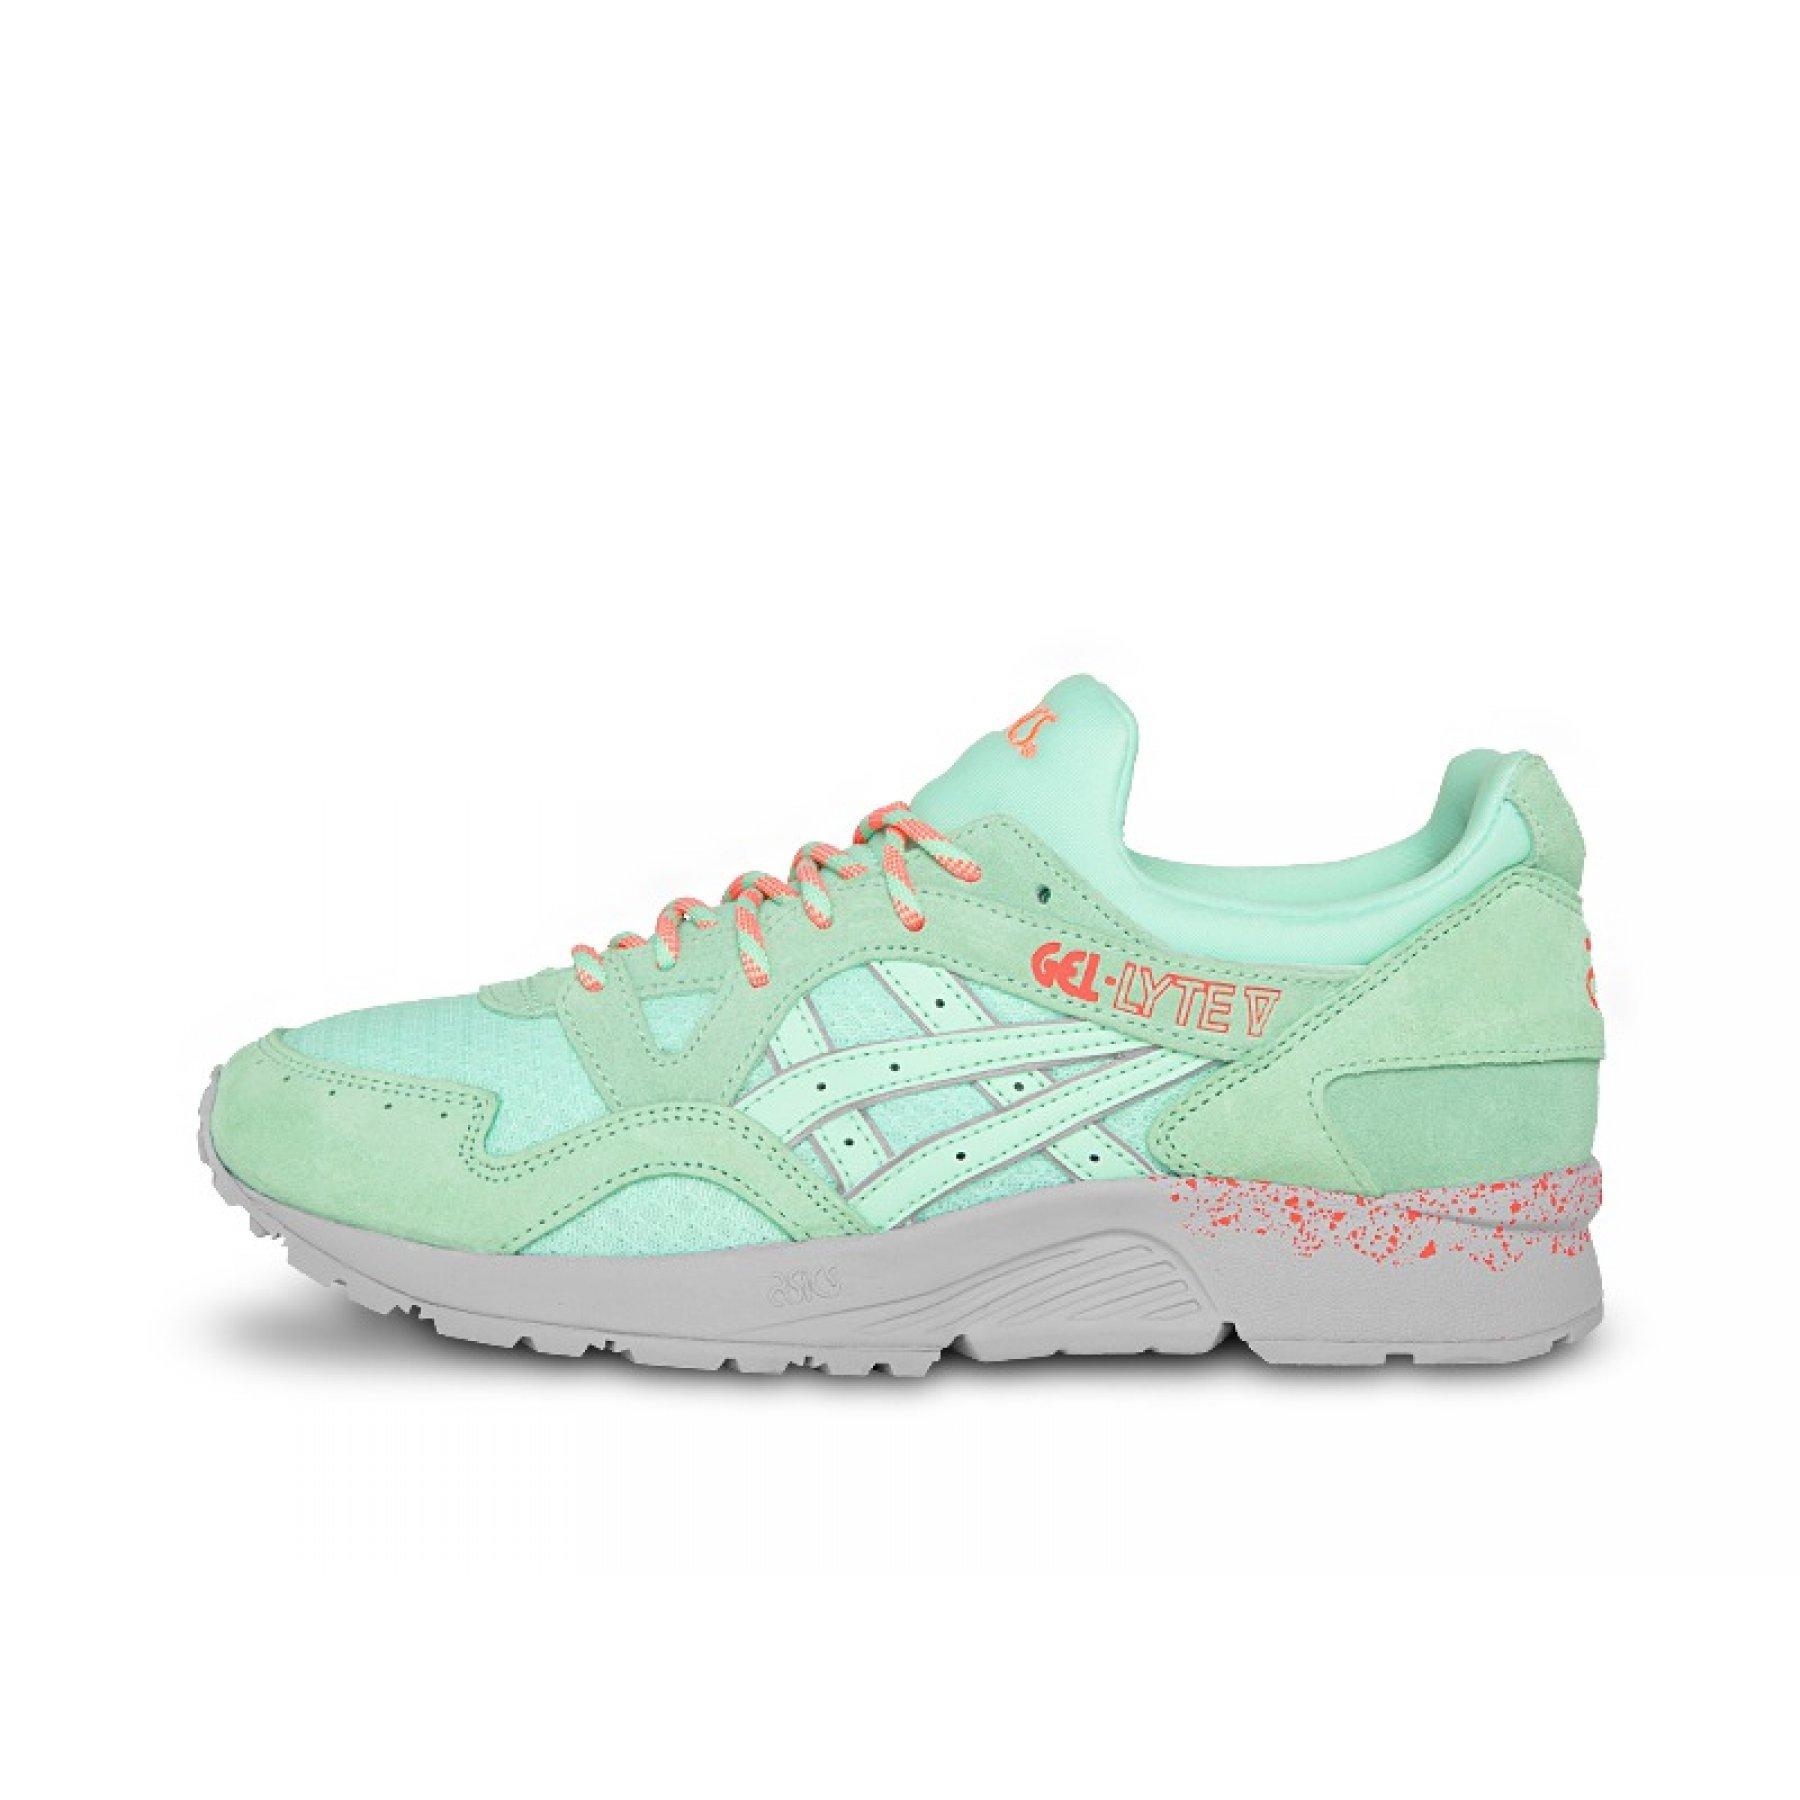 online store 52f5d 71ae6 Asics Gel-Lyte V W Bay/Bay Running Shoes